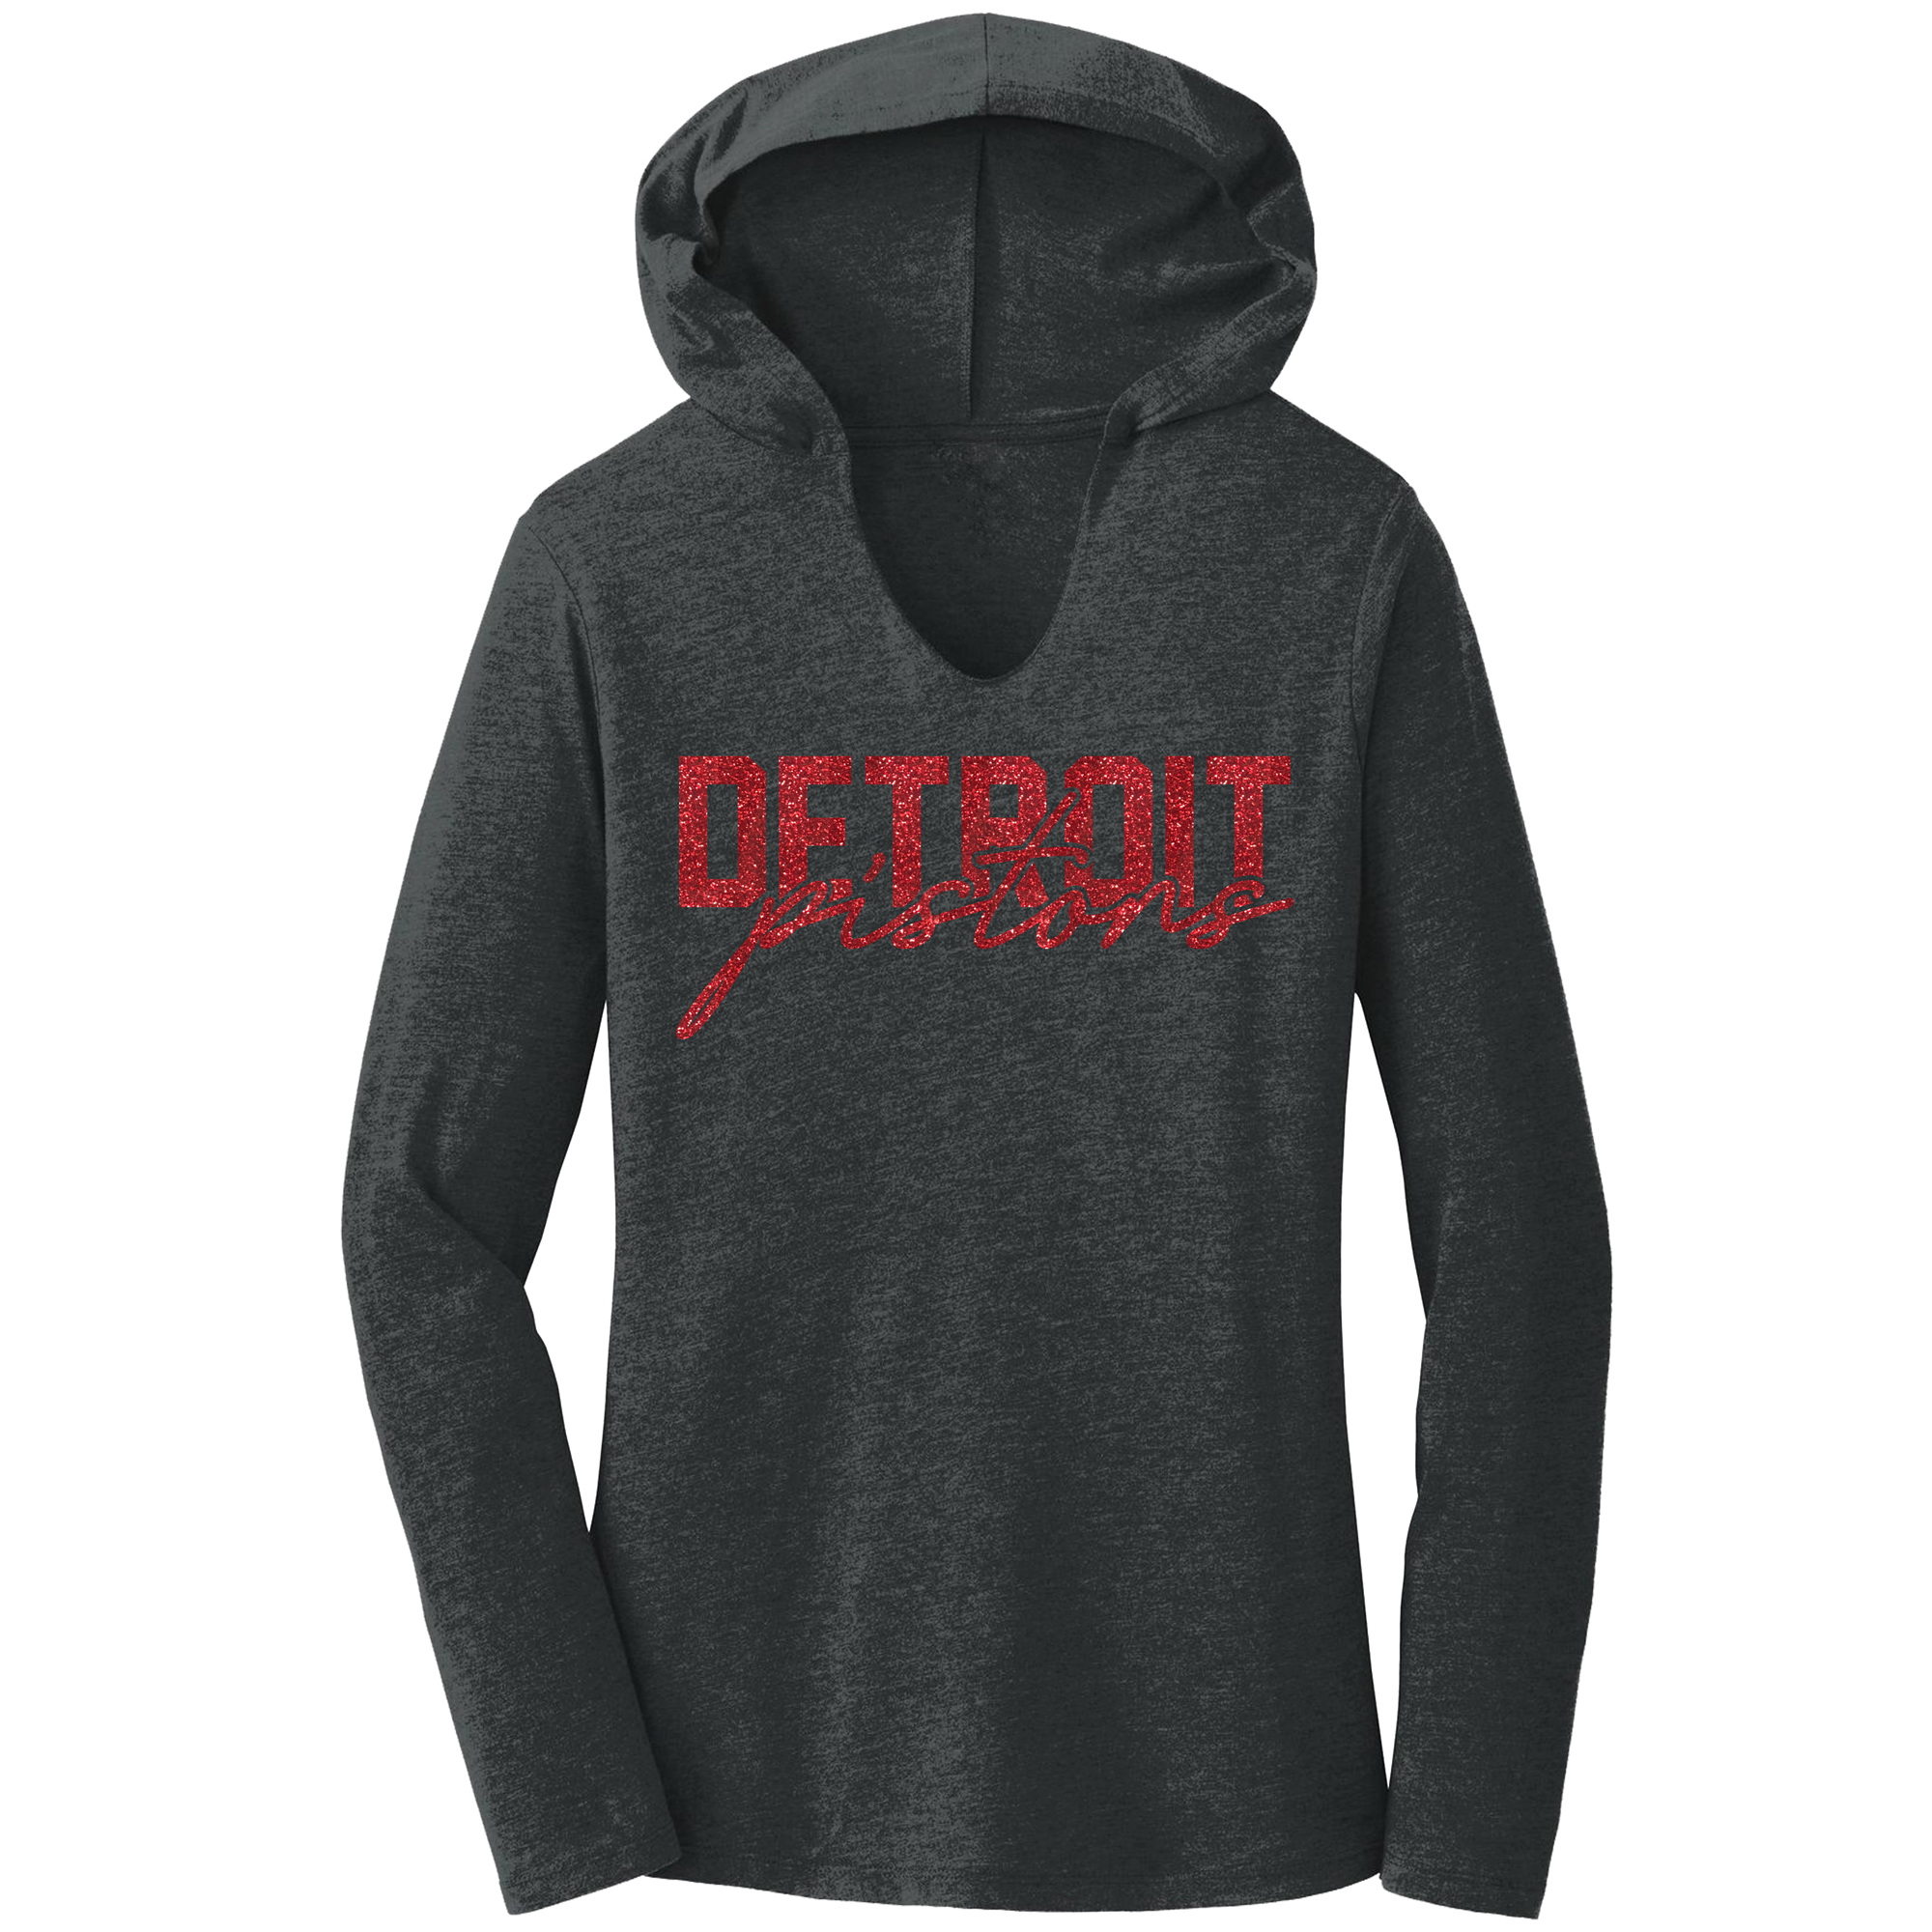 Detroit Pistons Women's Bling Hoodie - Charcoal